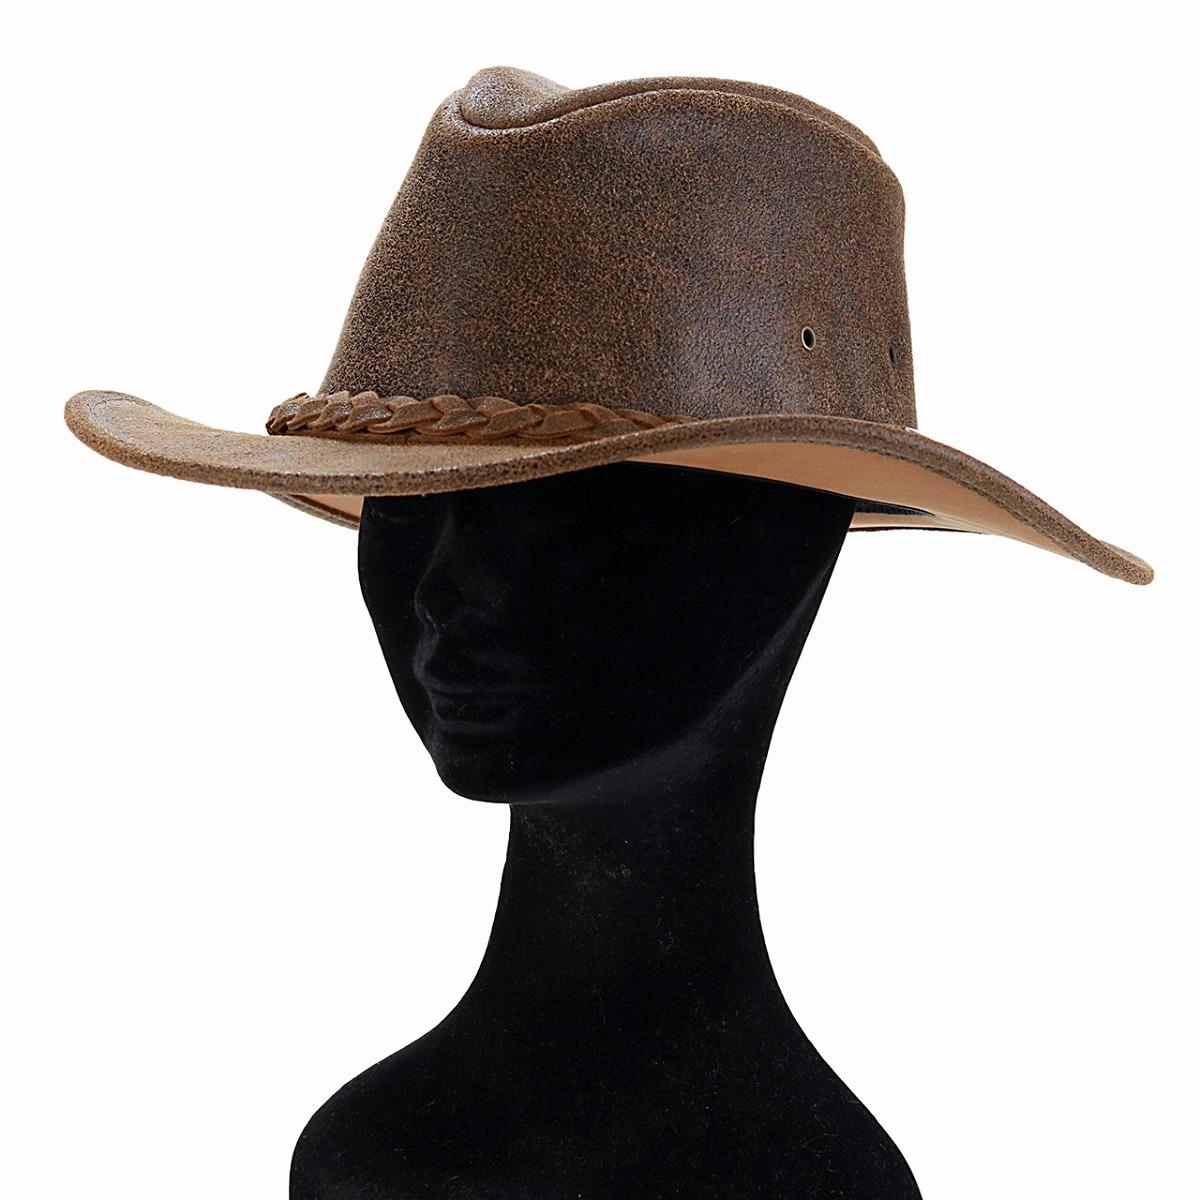 9b24b5023e4d8 Genuine leather cowboy hat Henshel leather hat HENSCHEL damage processing  crusher bulldog cowhide suede hat western vintage tea brown  cowboy hat   Father s ...